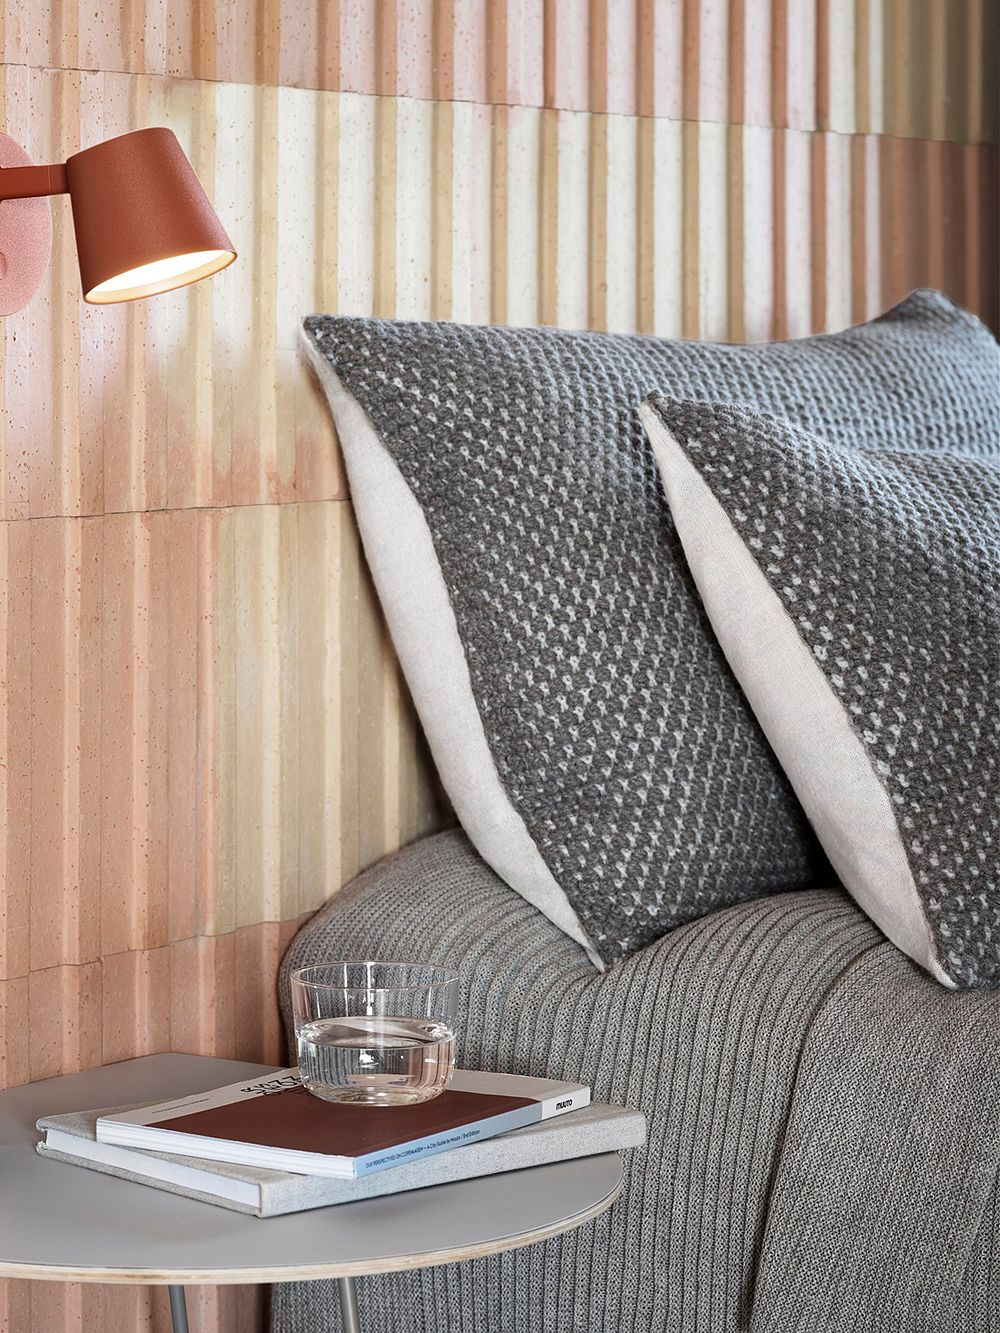 Muuto's Twine cushions